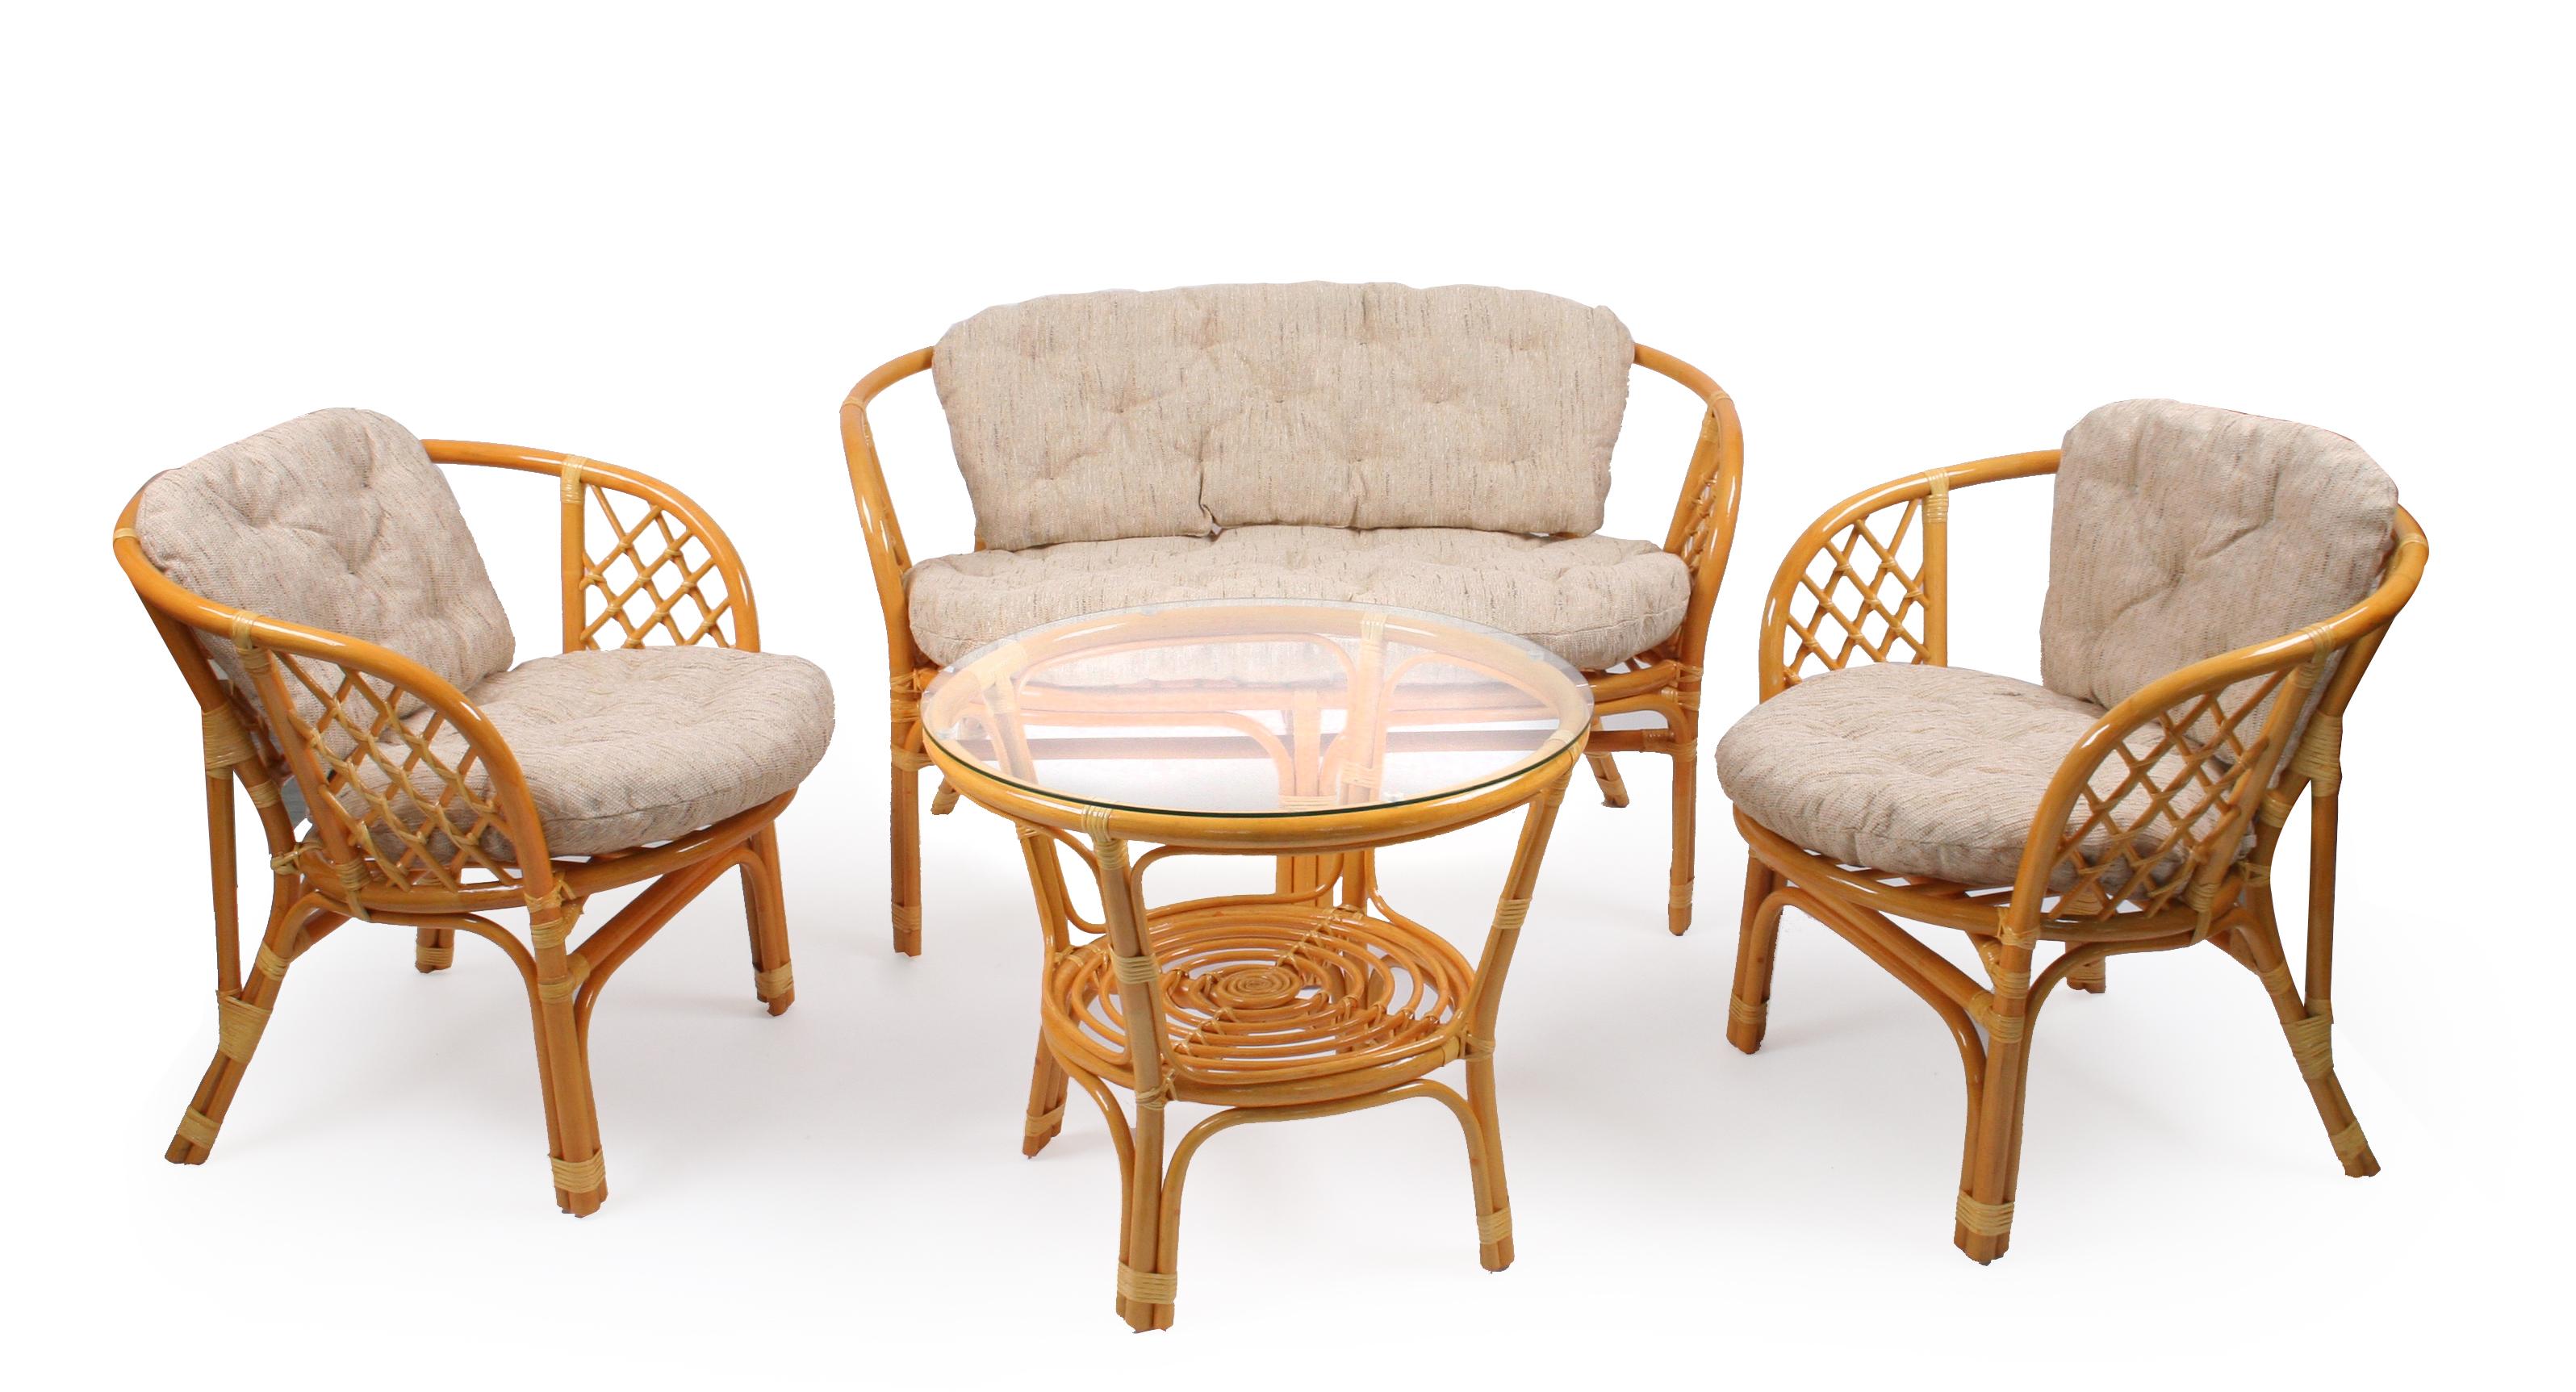 Комплект мебели из ротанга bahama (багама) i: продажа, цена .